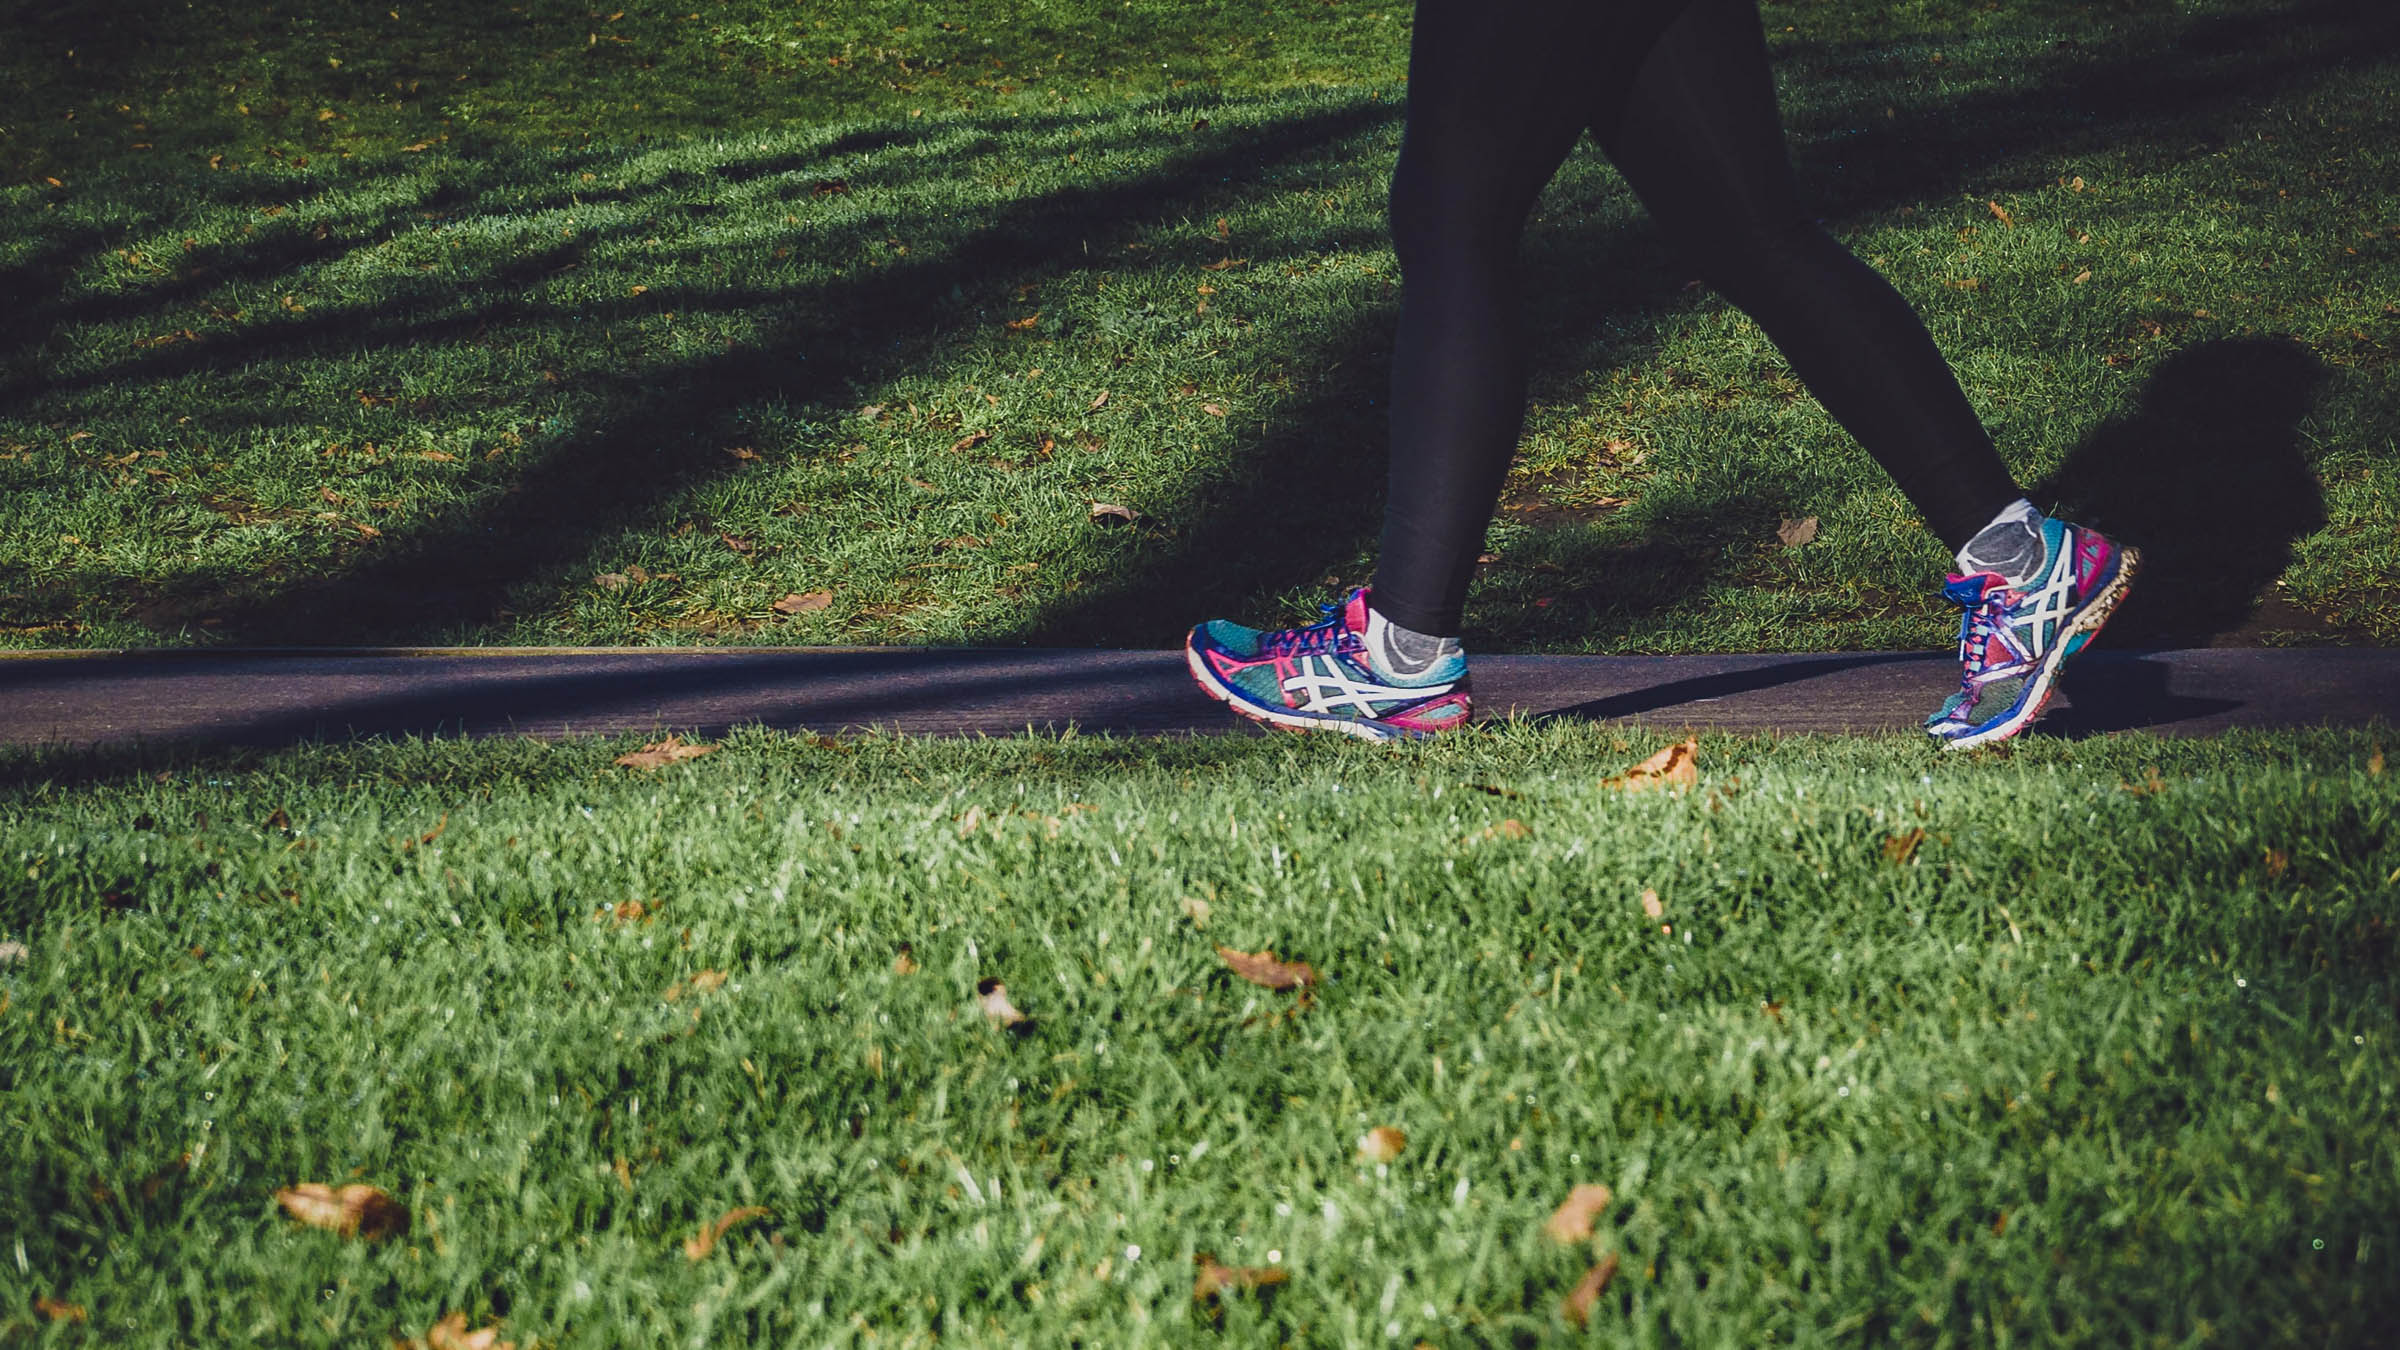 Woman run/walking on a sidewalk